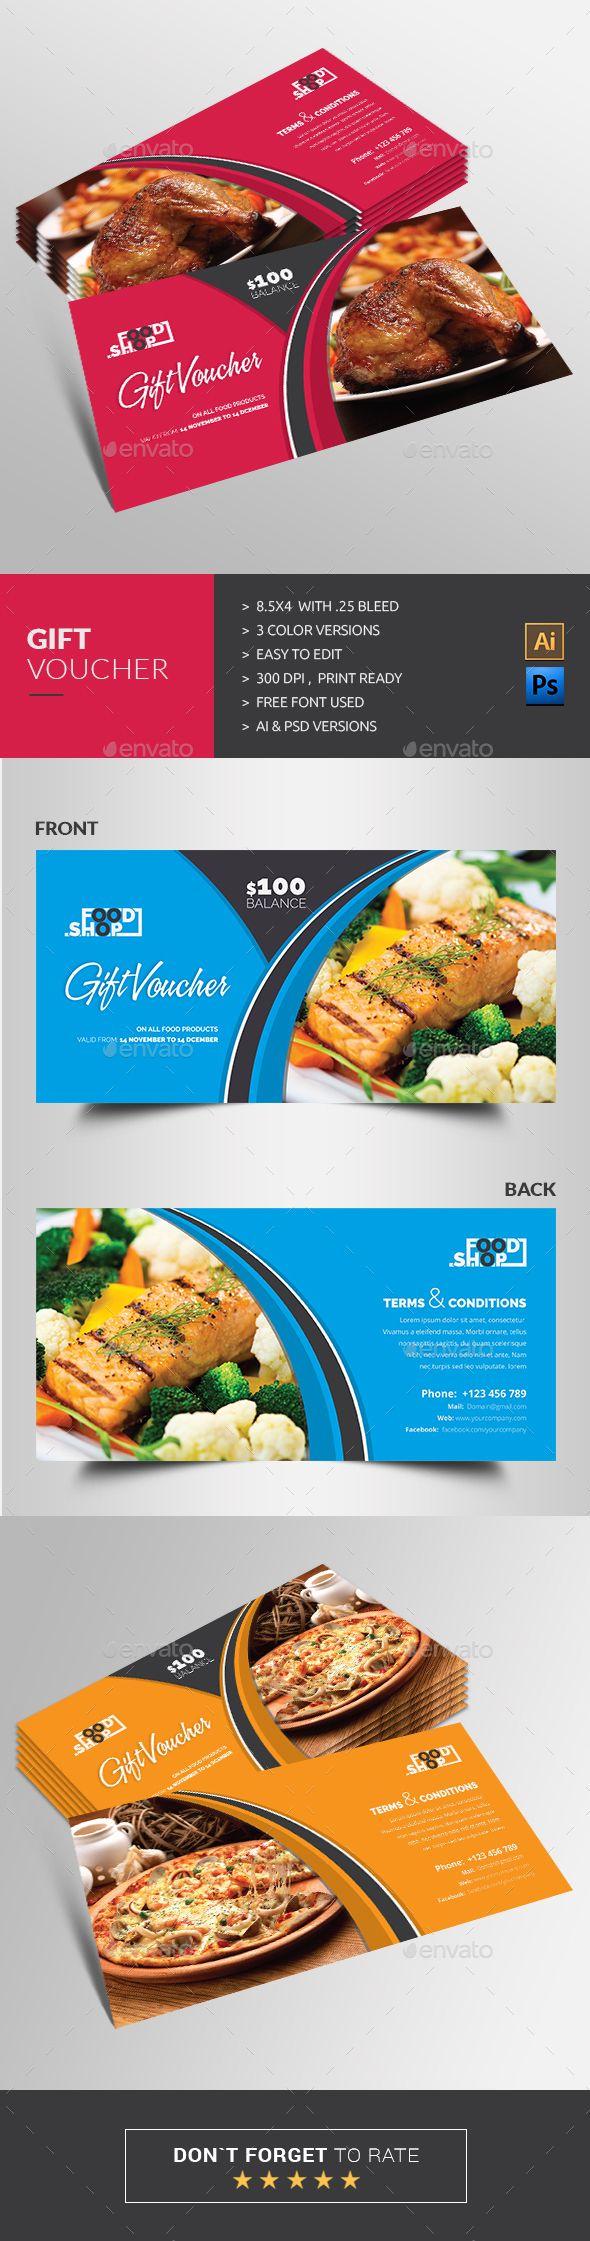 Gift Voucher Template PSD, AI #design Download: http://graphicriver.net/item/gift-voucher/13784561?ref=ksioks